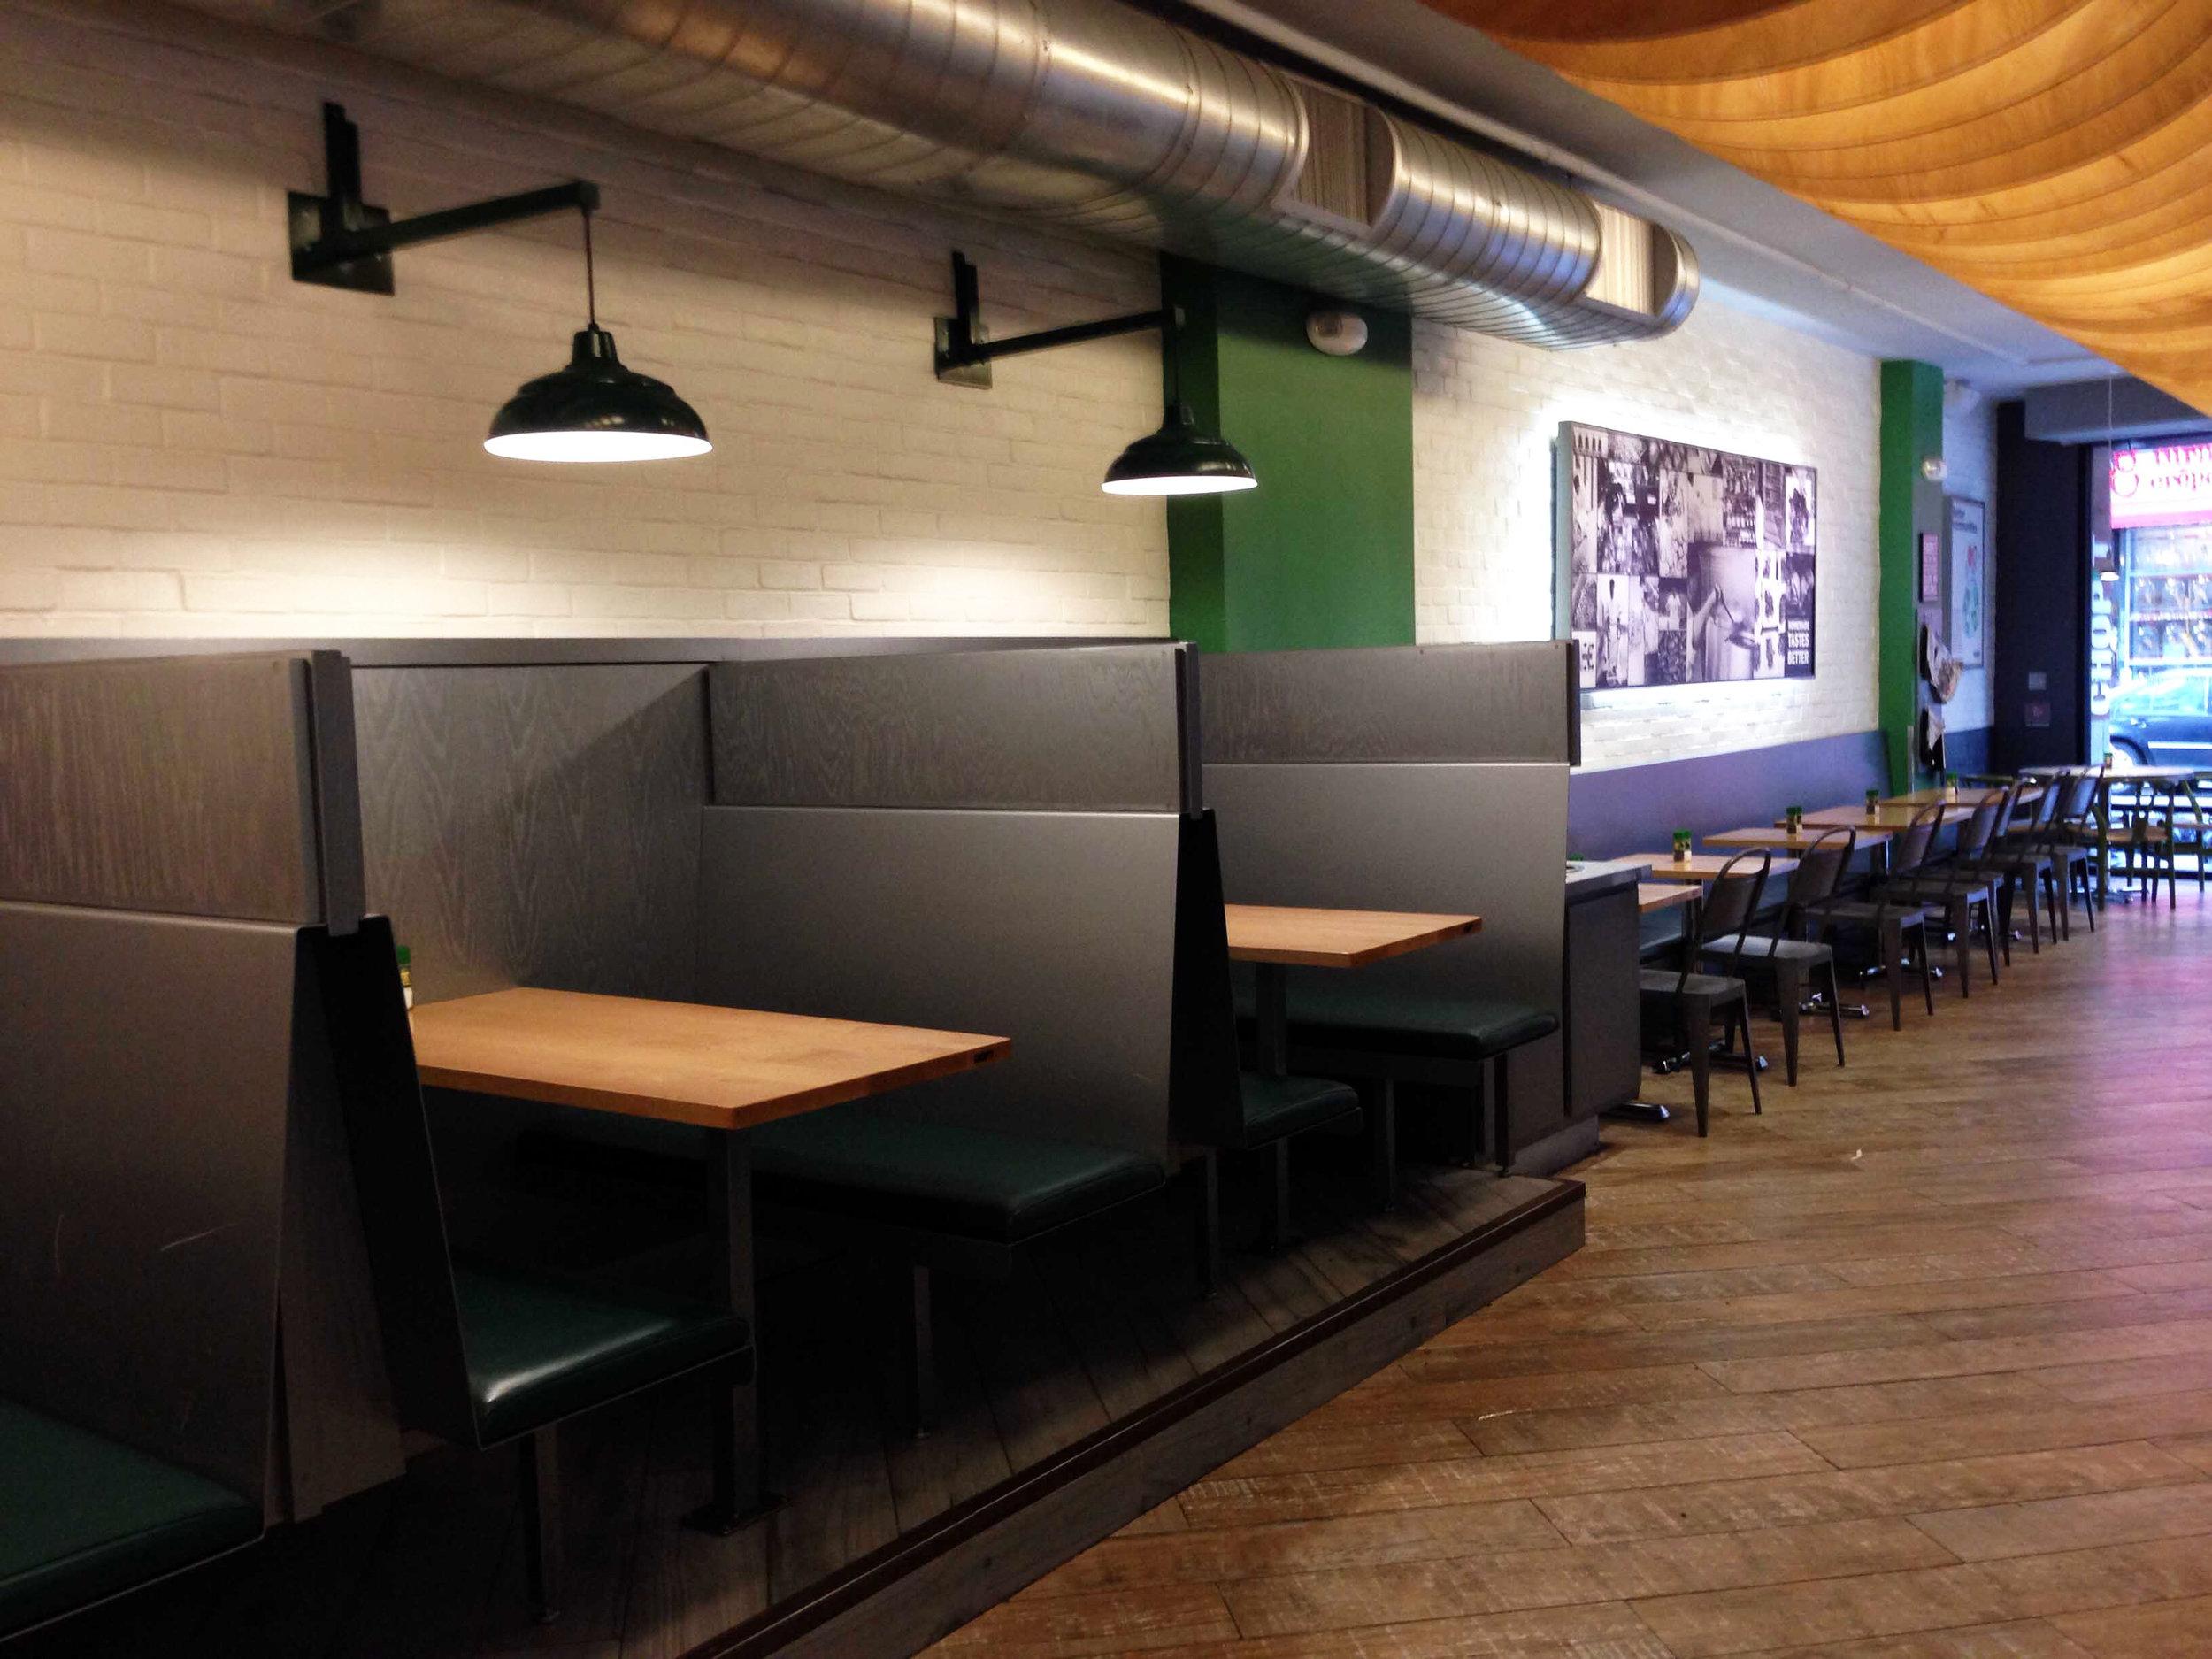 Dark wood booth seating with overhead lighting inside Chop't Salad in the Nolita neighborhood of New York. MEP designed by 2L Engineering.